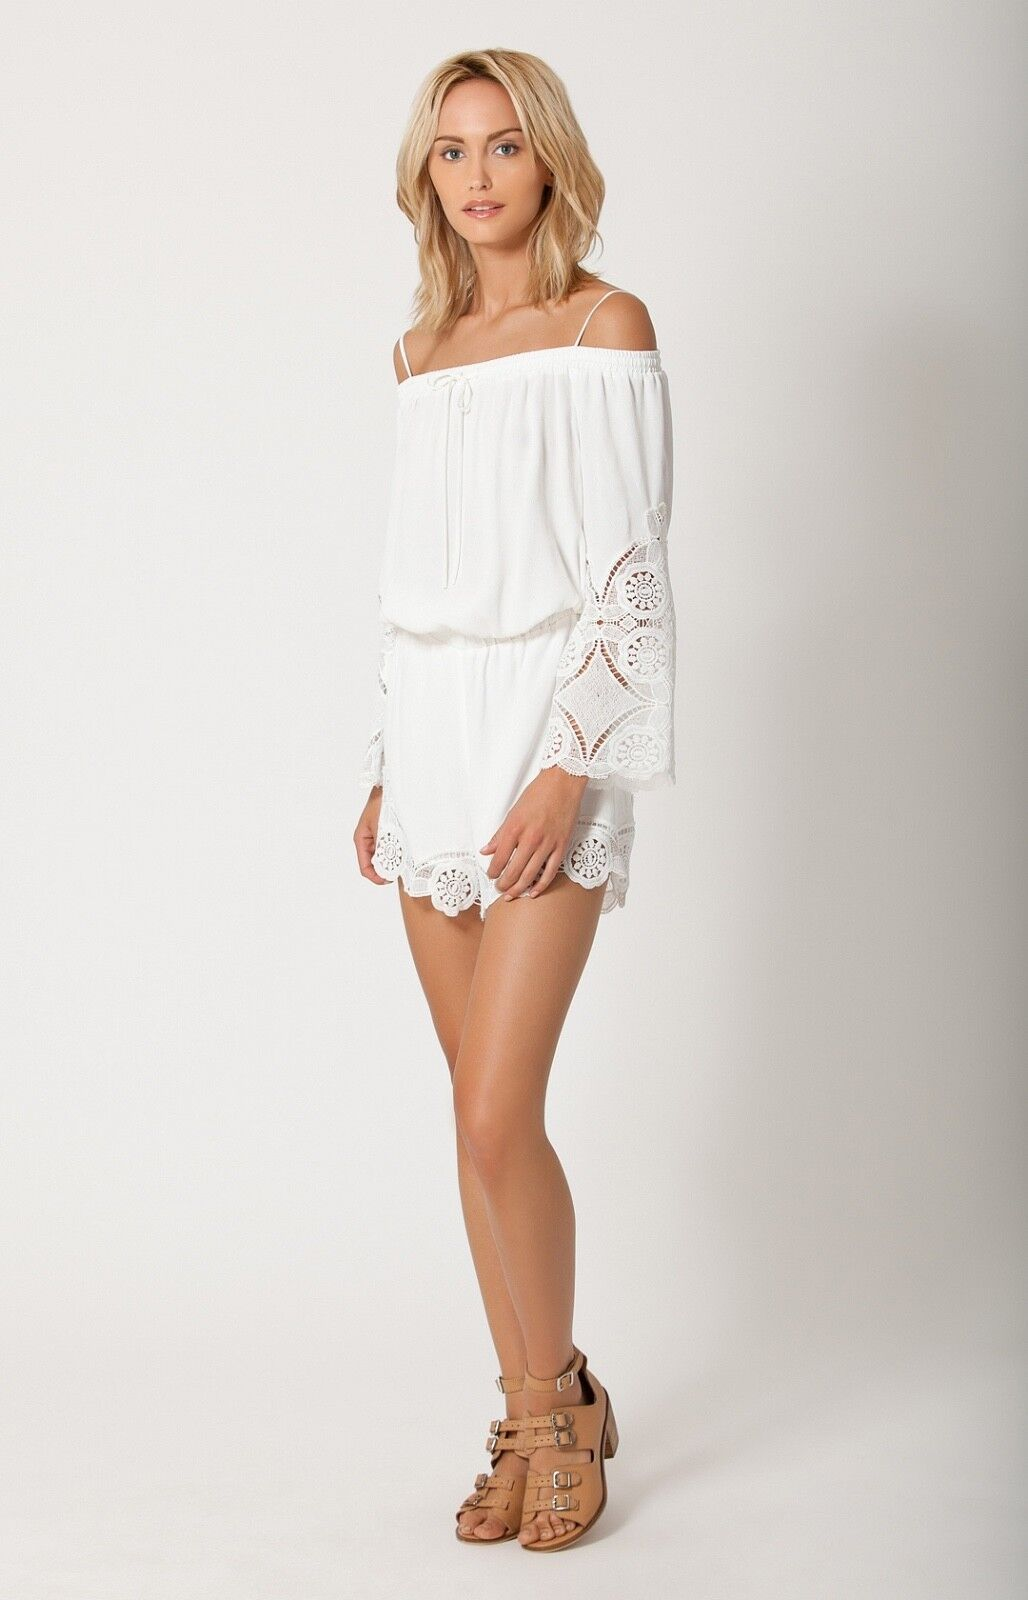 Ivory White Off Shoulder Romper XS   Lace Crochet Shorts Liberty Garden 5BRN8328